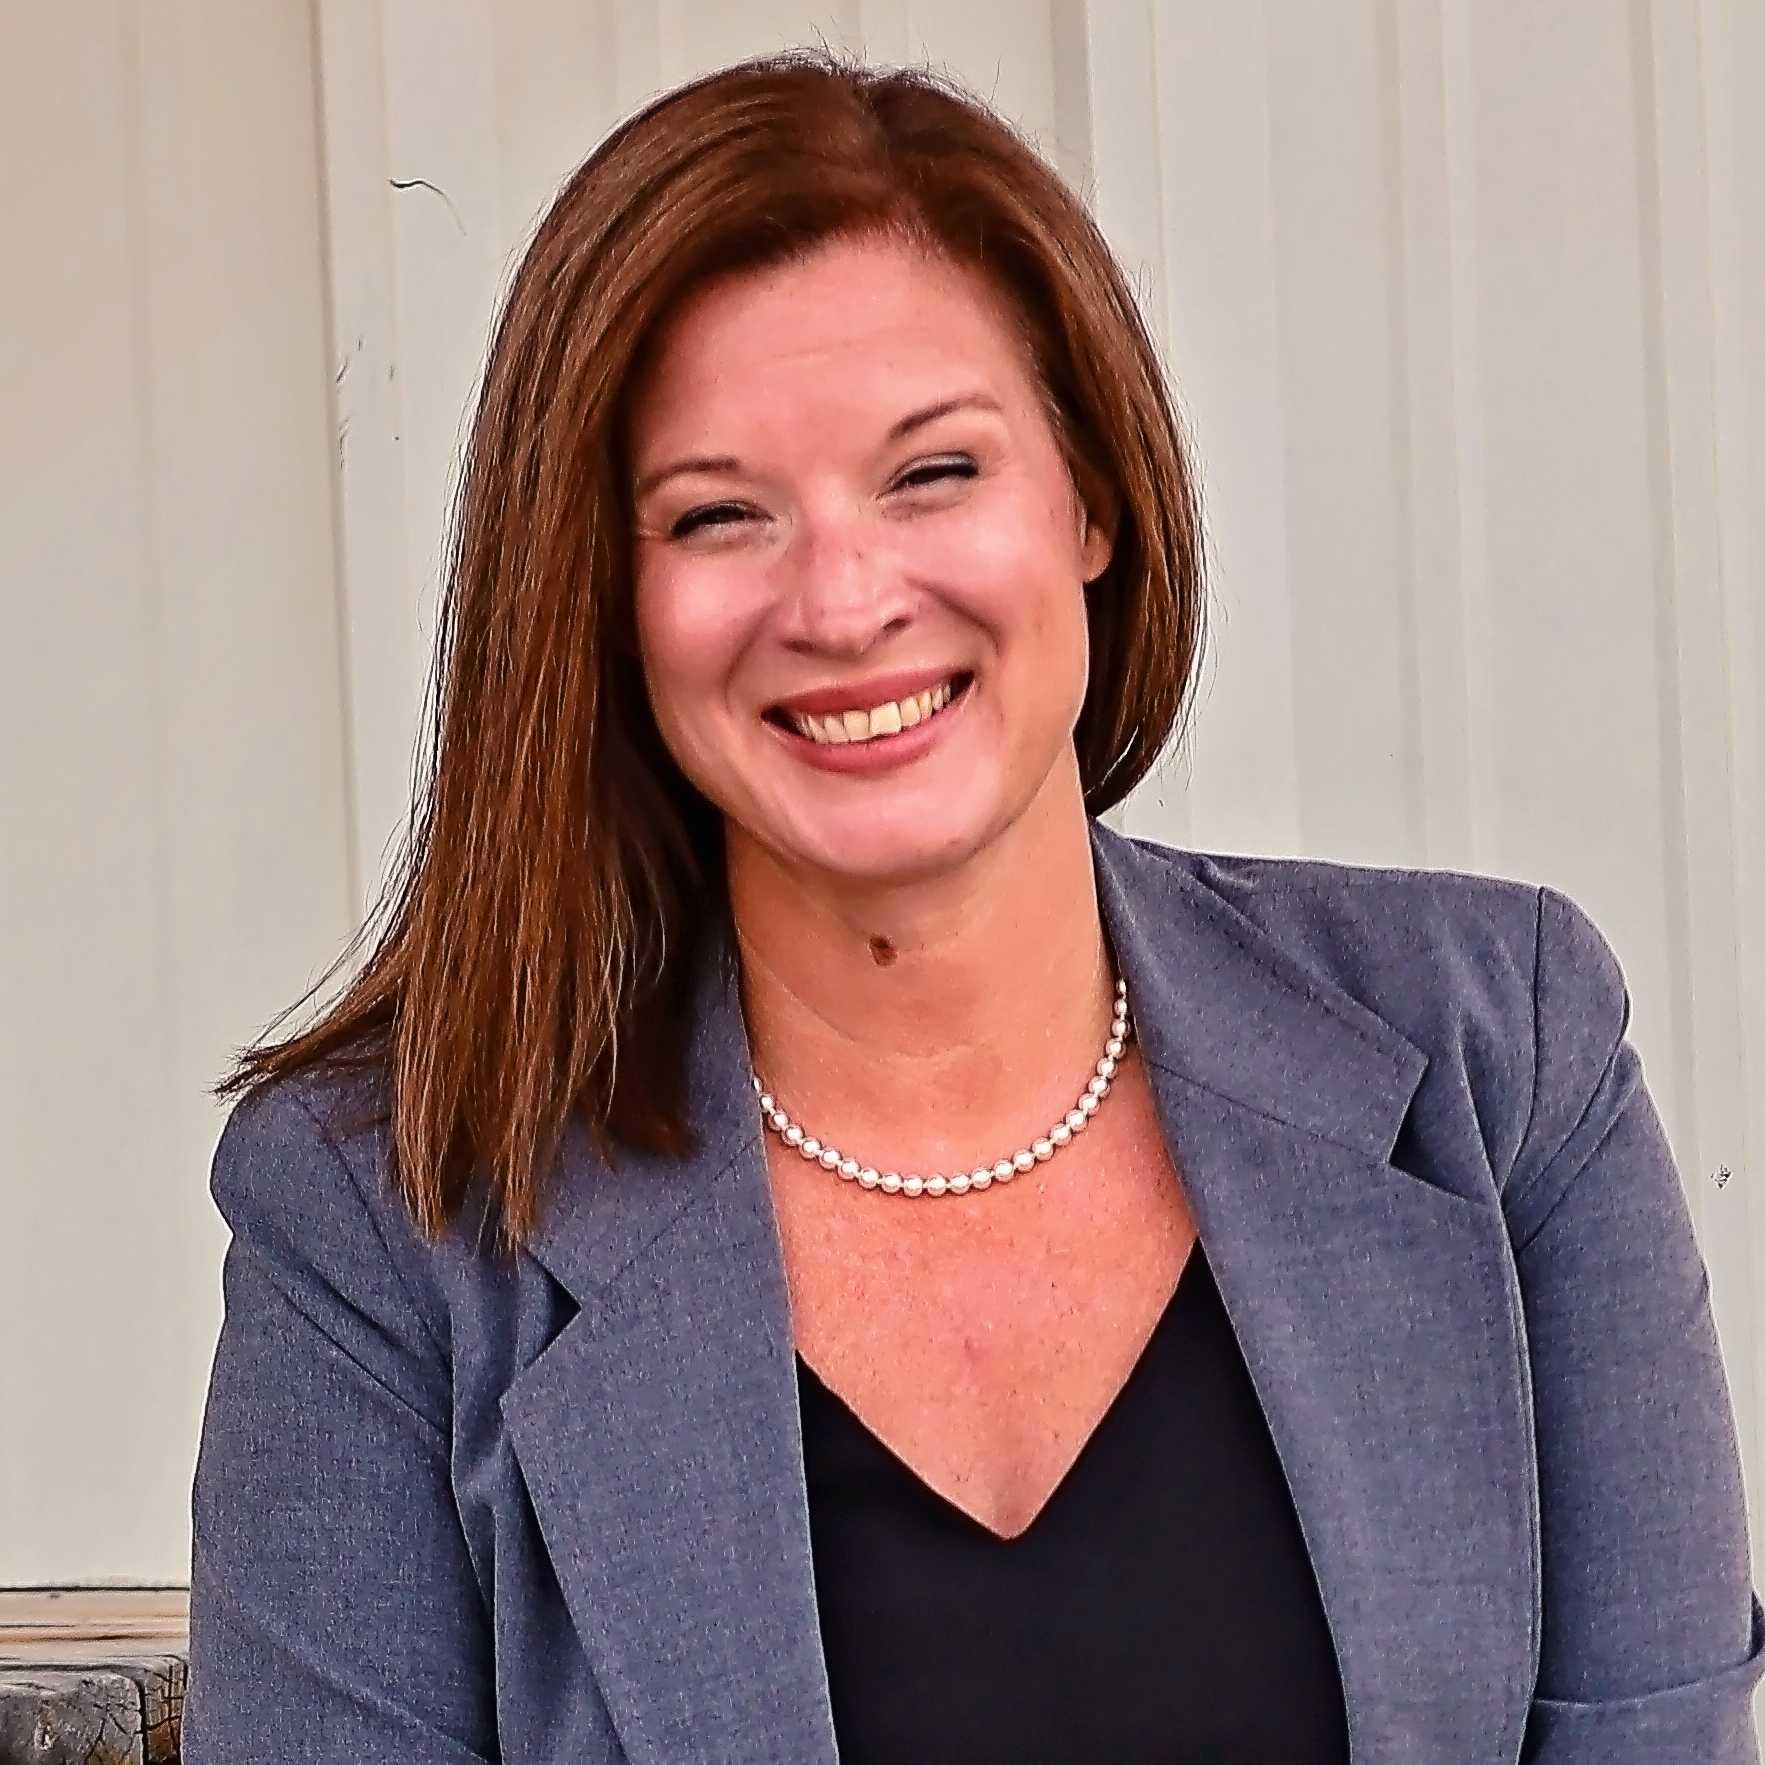 Sarah Rosencutter